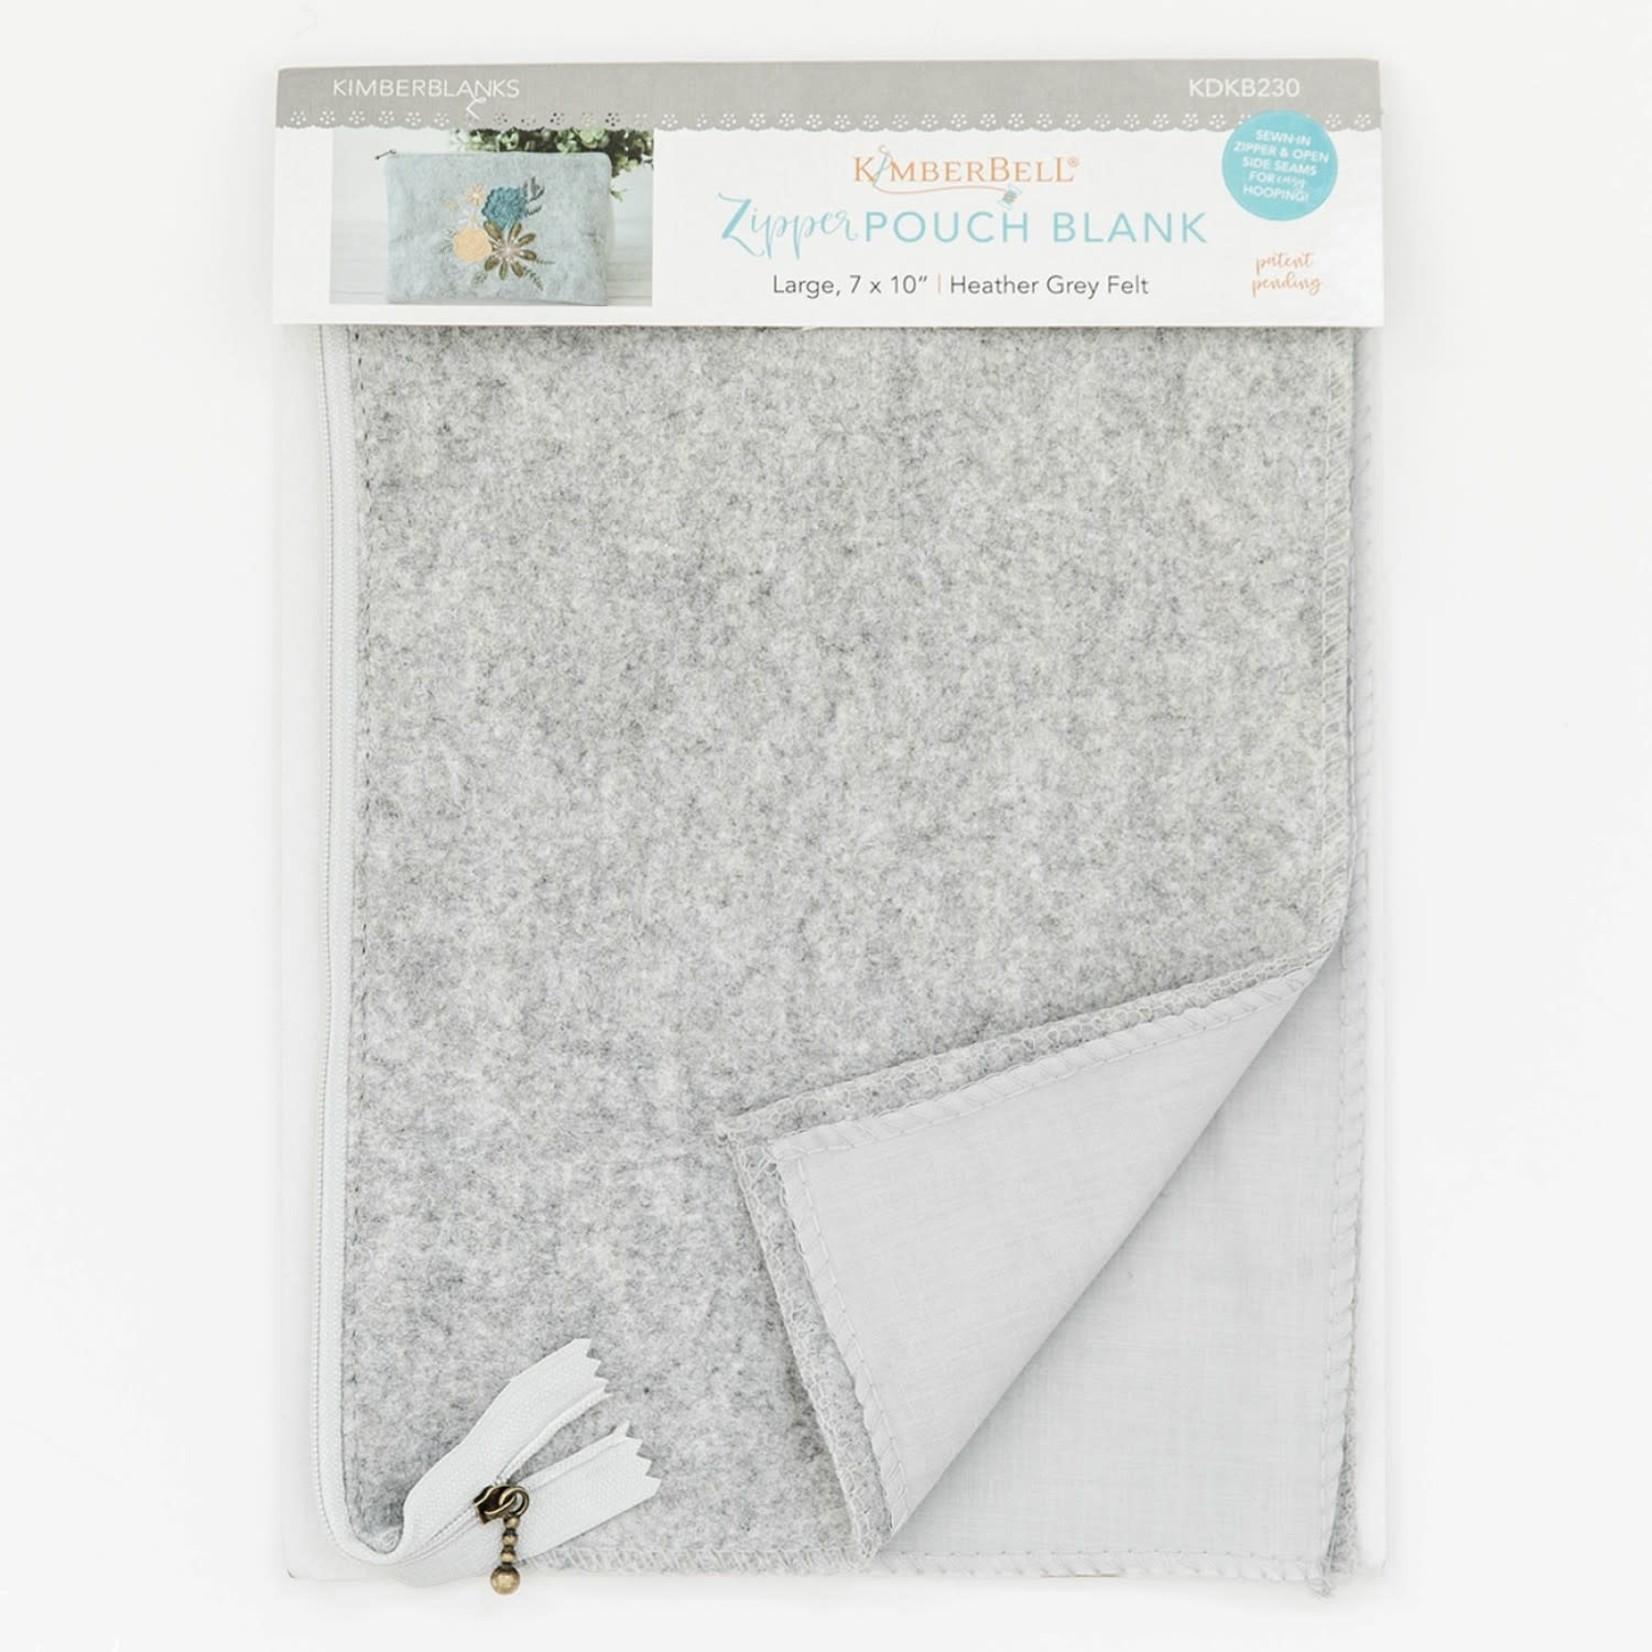 KIMBERBELL DESIGNS Heather Gray Felt Zipper Pouch Blank, Large